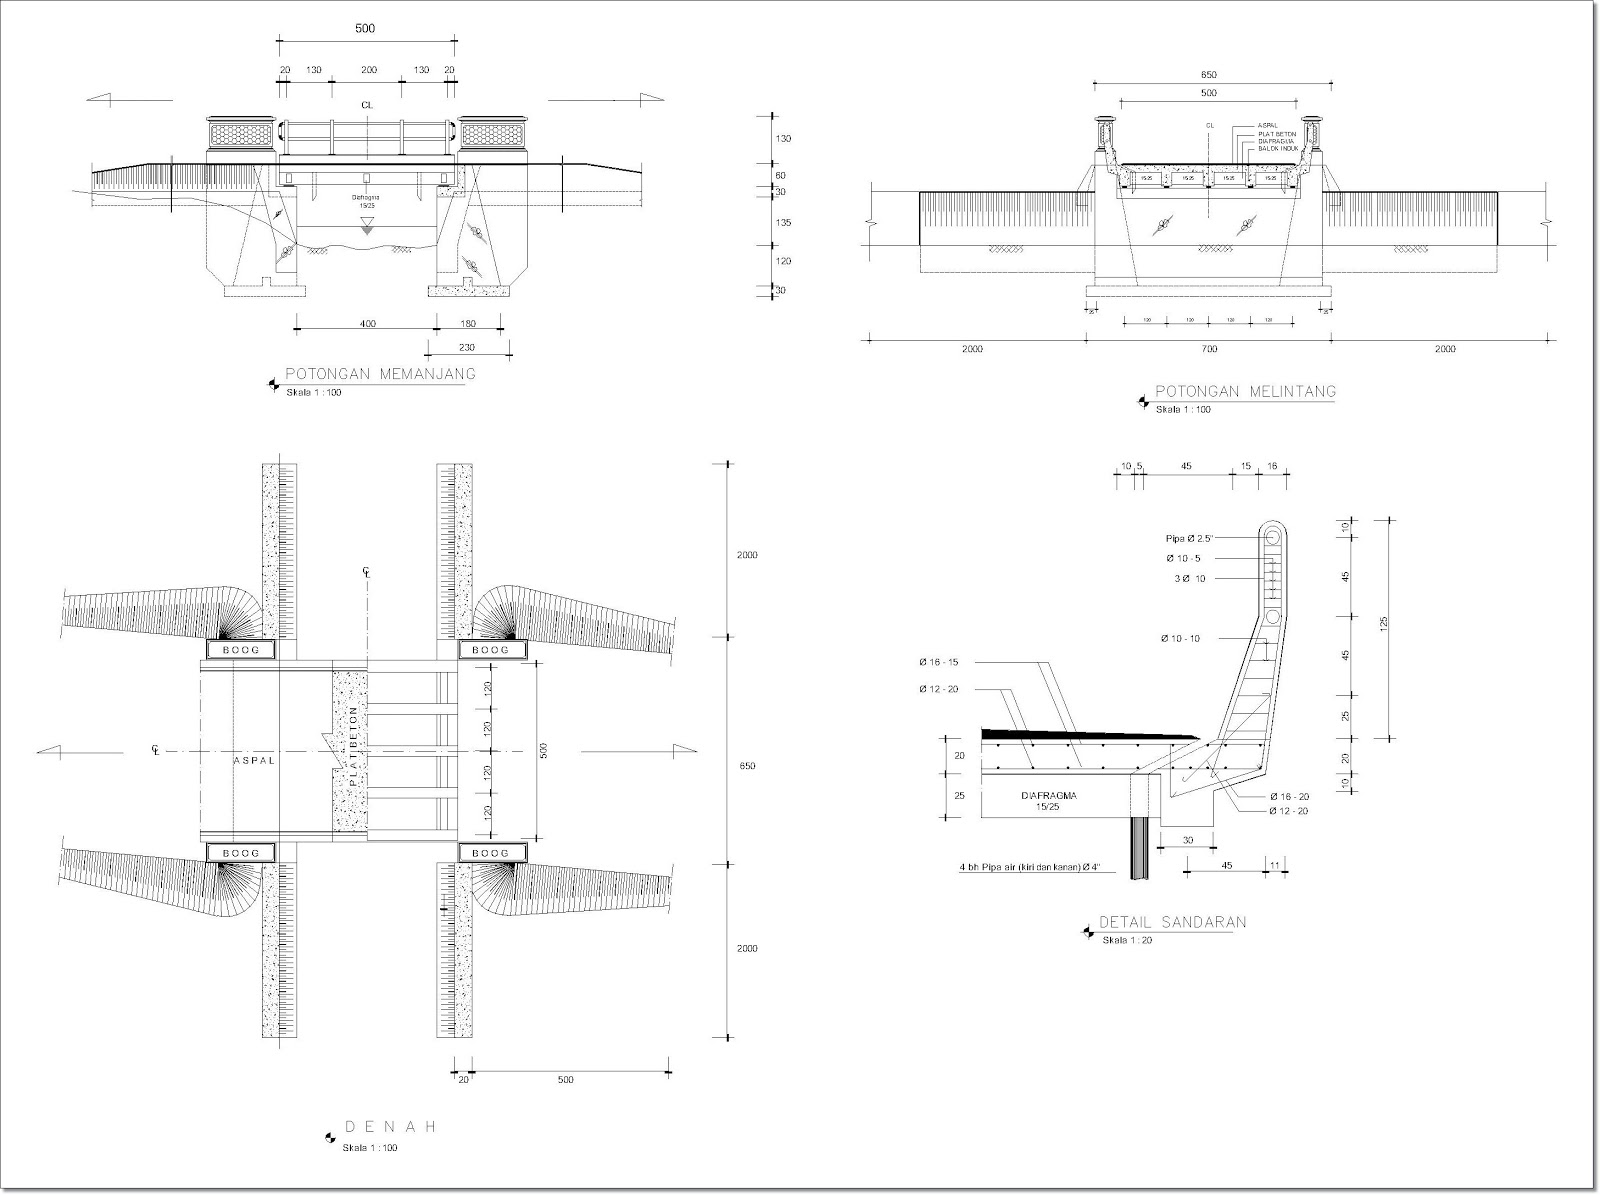 Image Result For Konstruksi Jembatan Sederhana